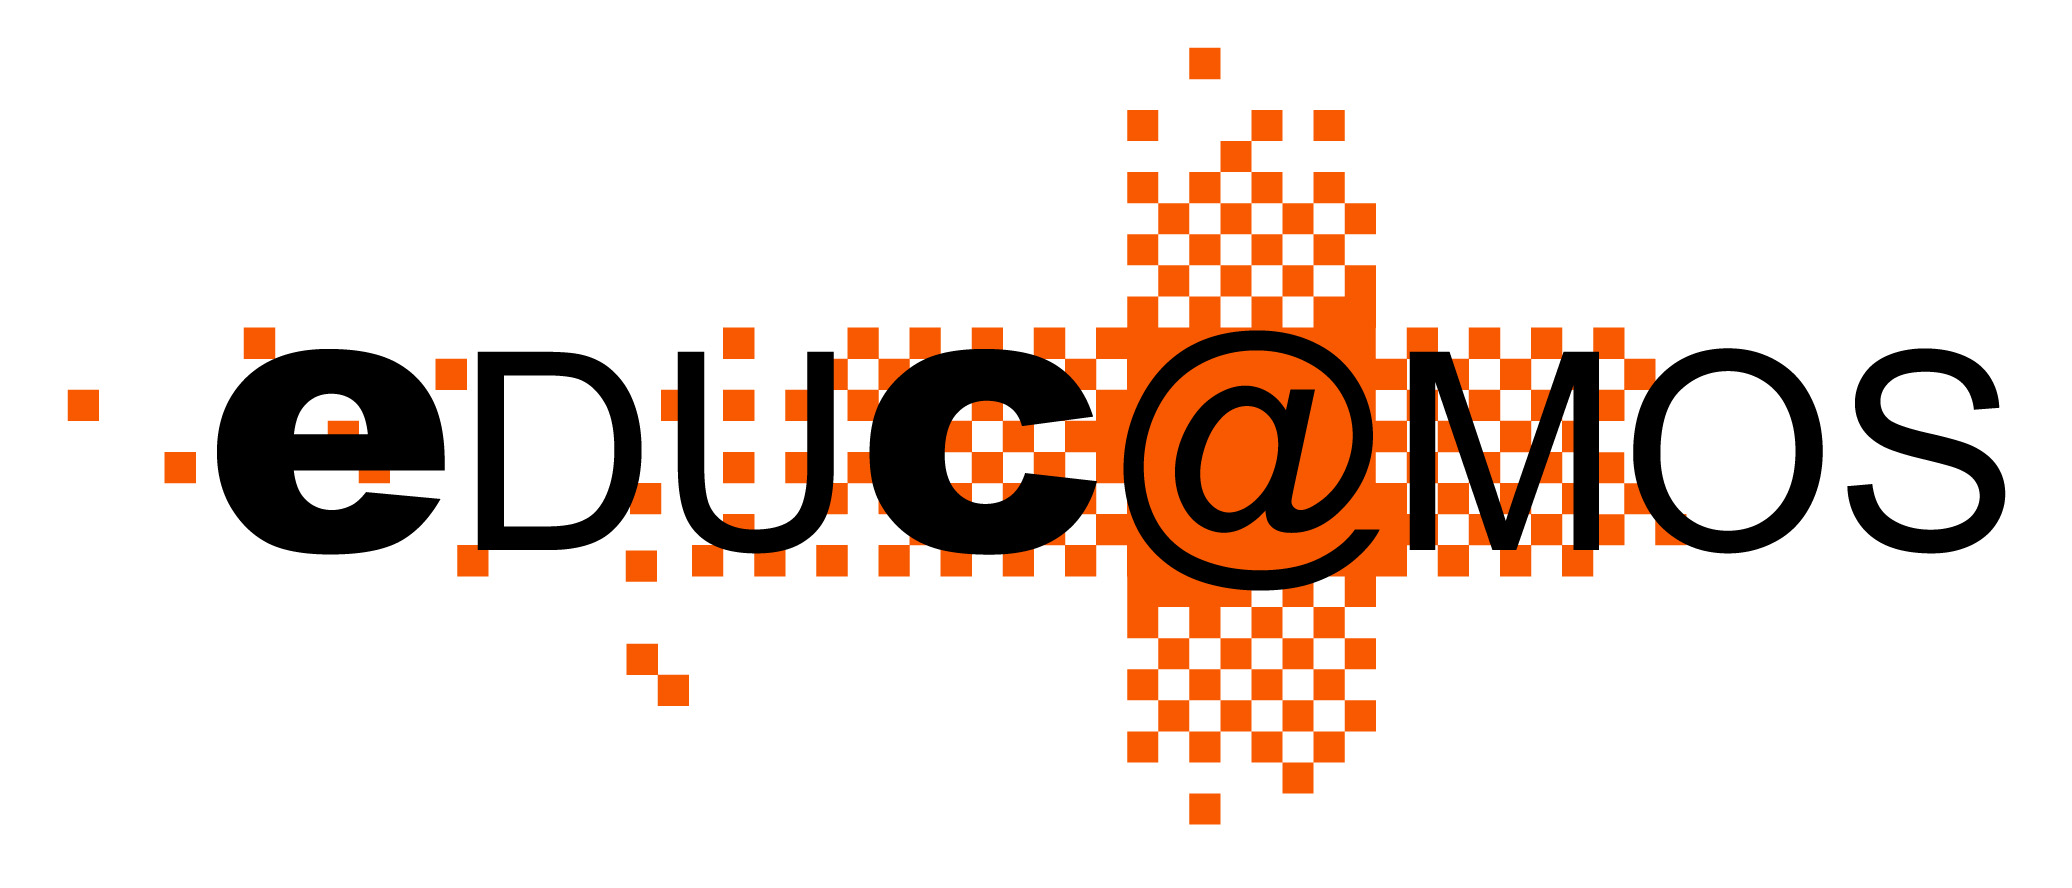 Logotipo Educ@mos